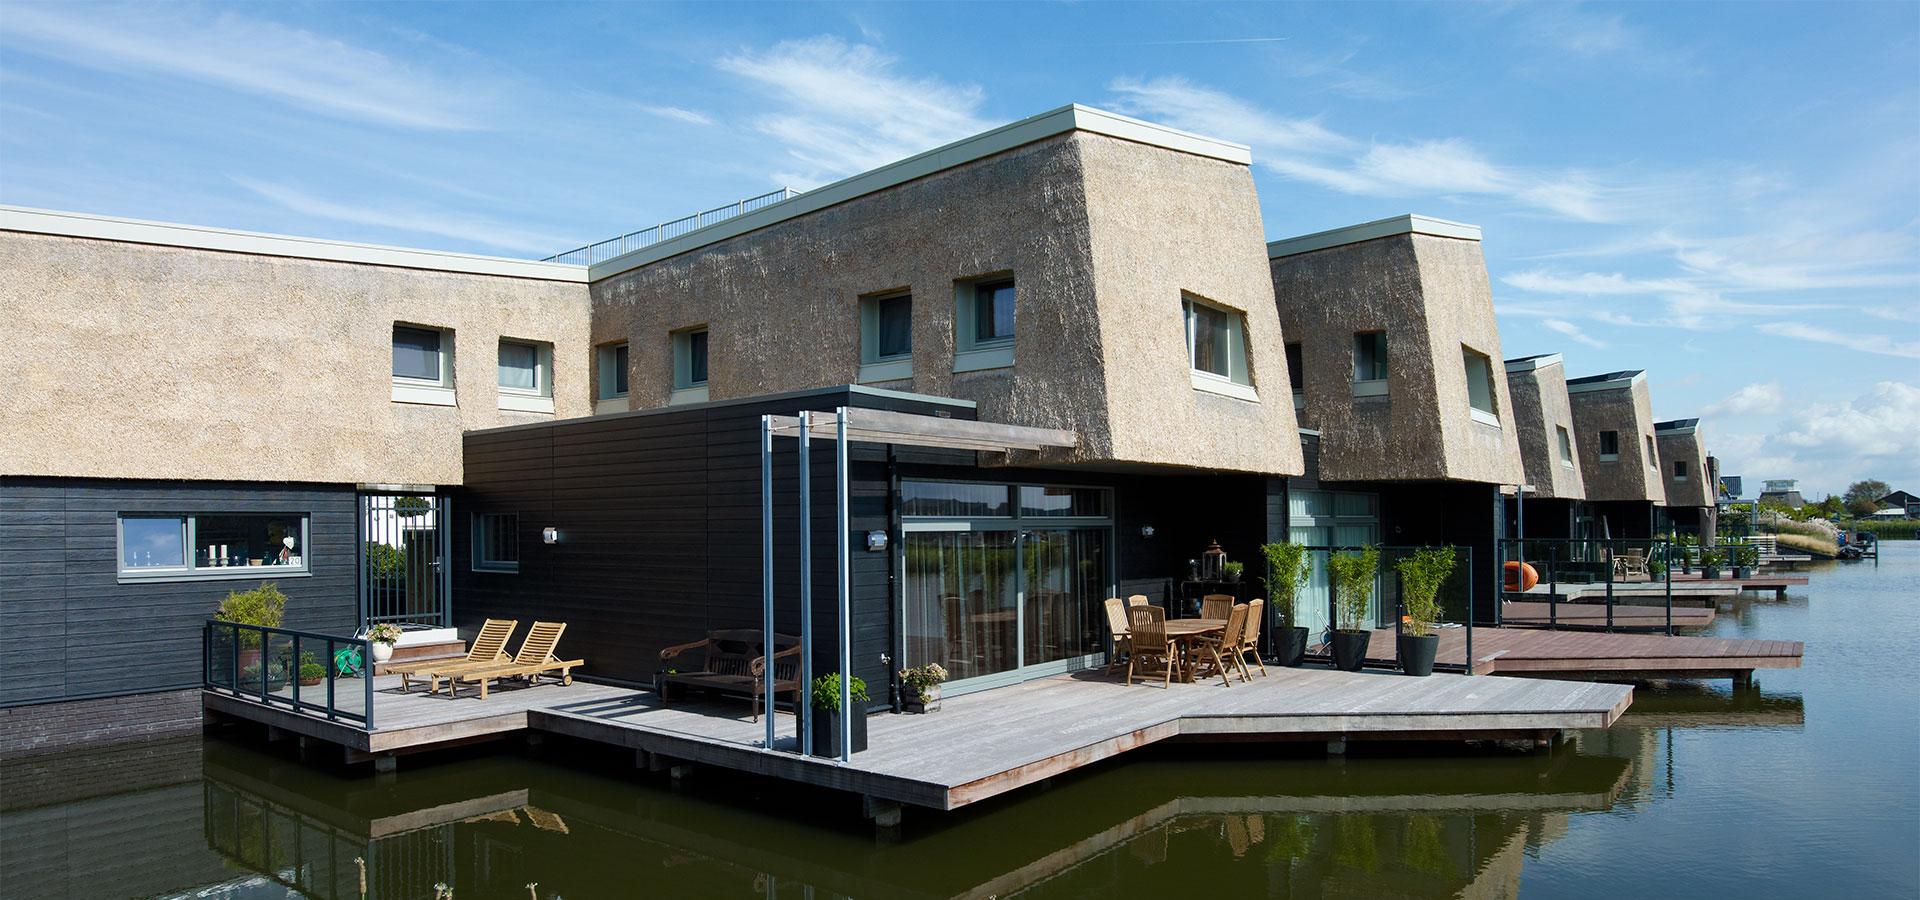 FARO architecten Waterwoningen Nesselande Rotterdam 03